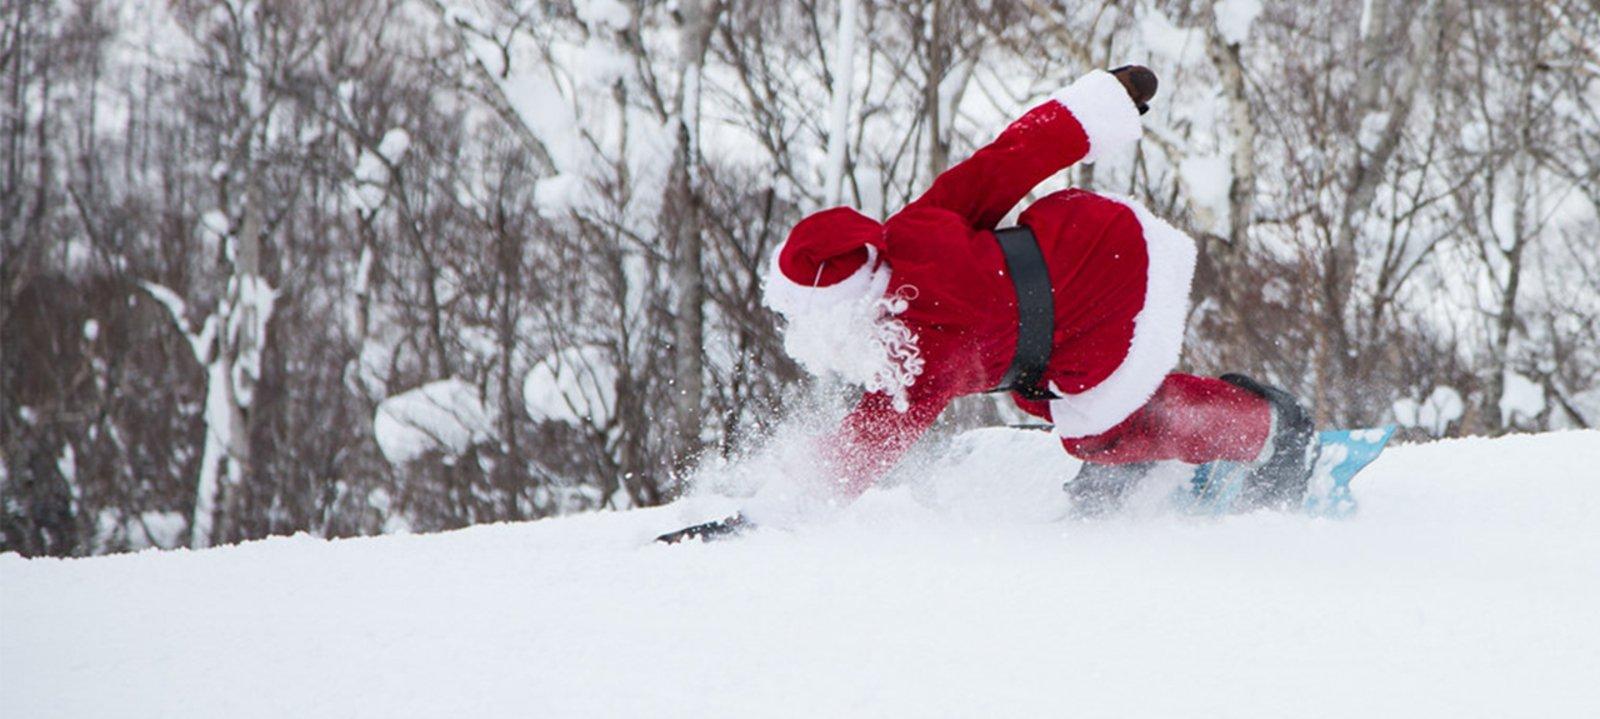 HAVE A WHITE CHRISTMAS AND SAVE BIG